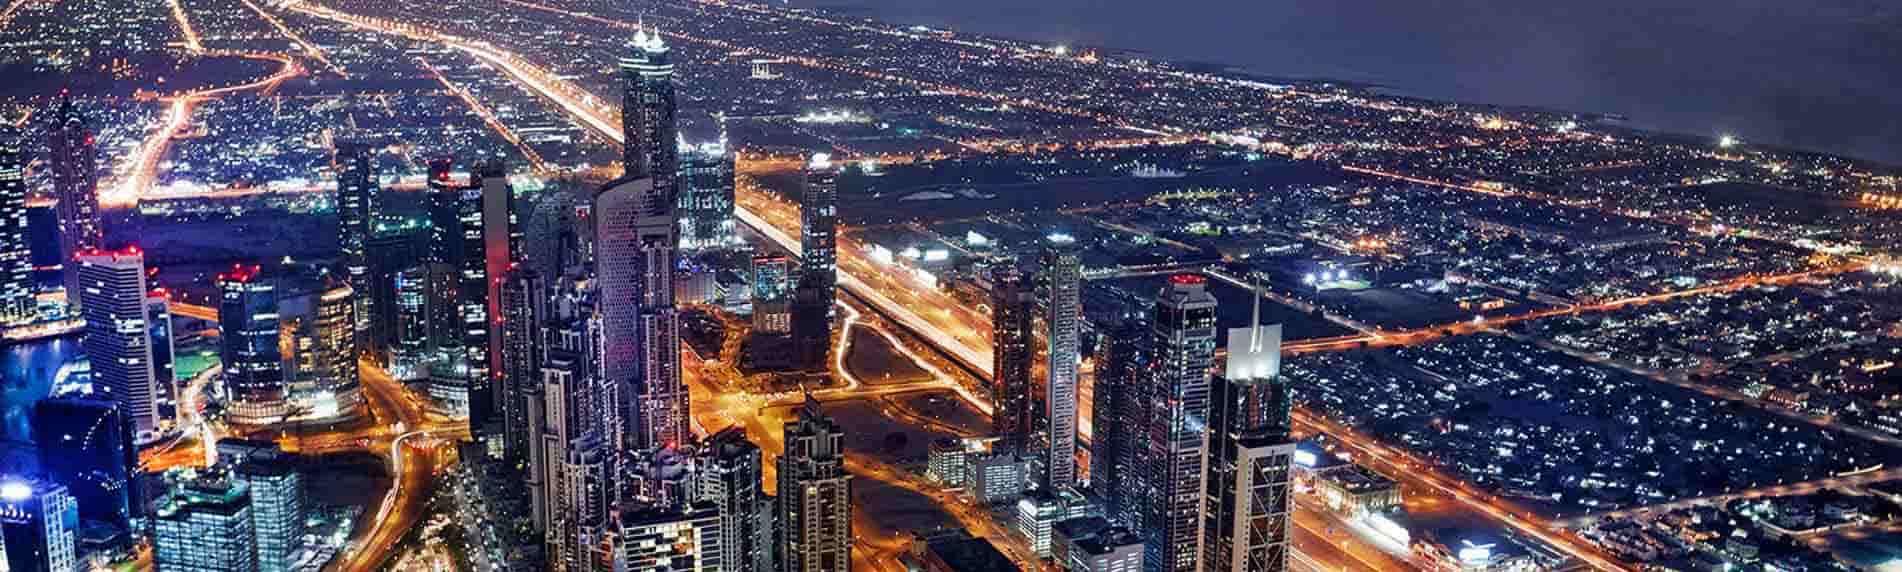 City Style Dubai